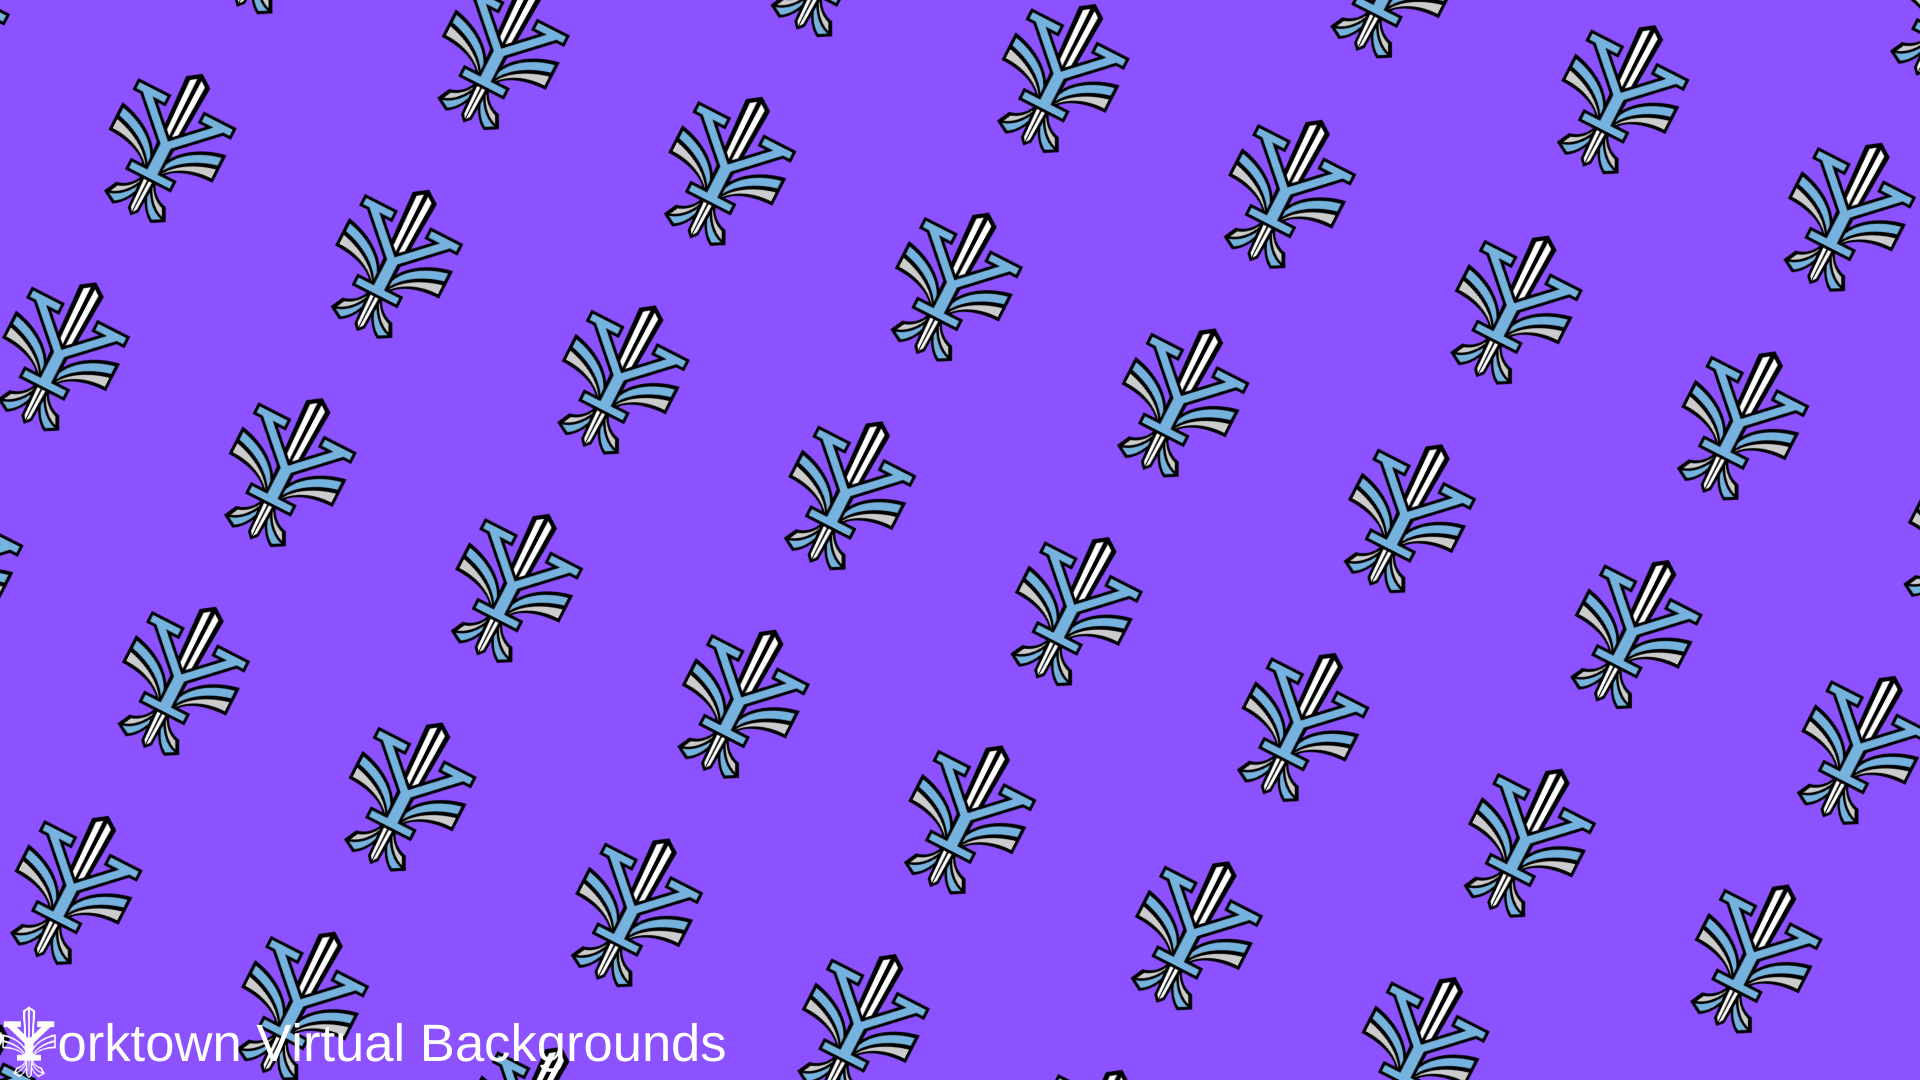 Yorktown Logo Wallpaper for Teams - Purple - Diagonal